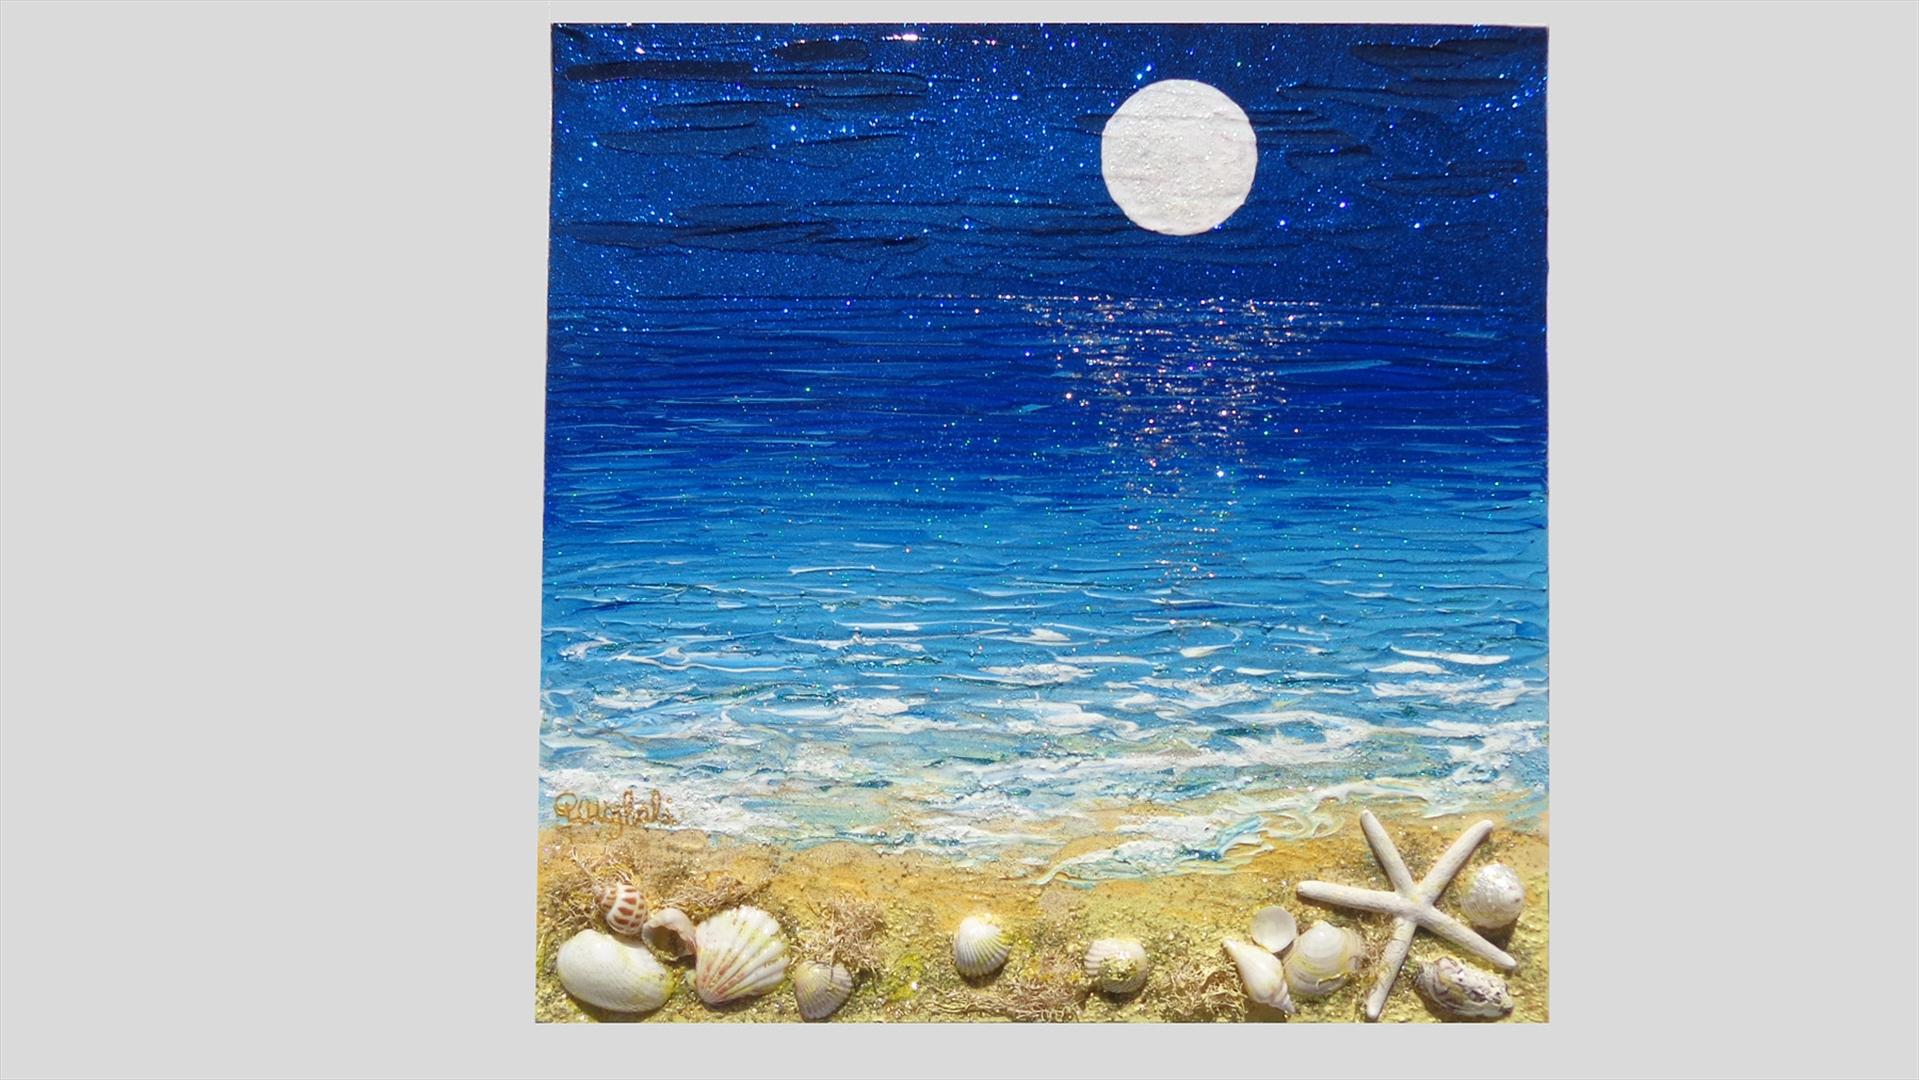 Stunning vendita quadri moderni on line ideas ameripest for Vendita dipinti online